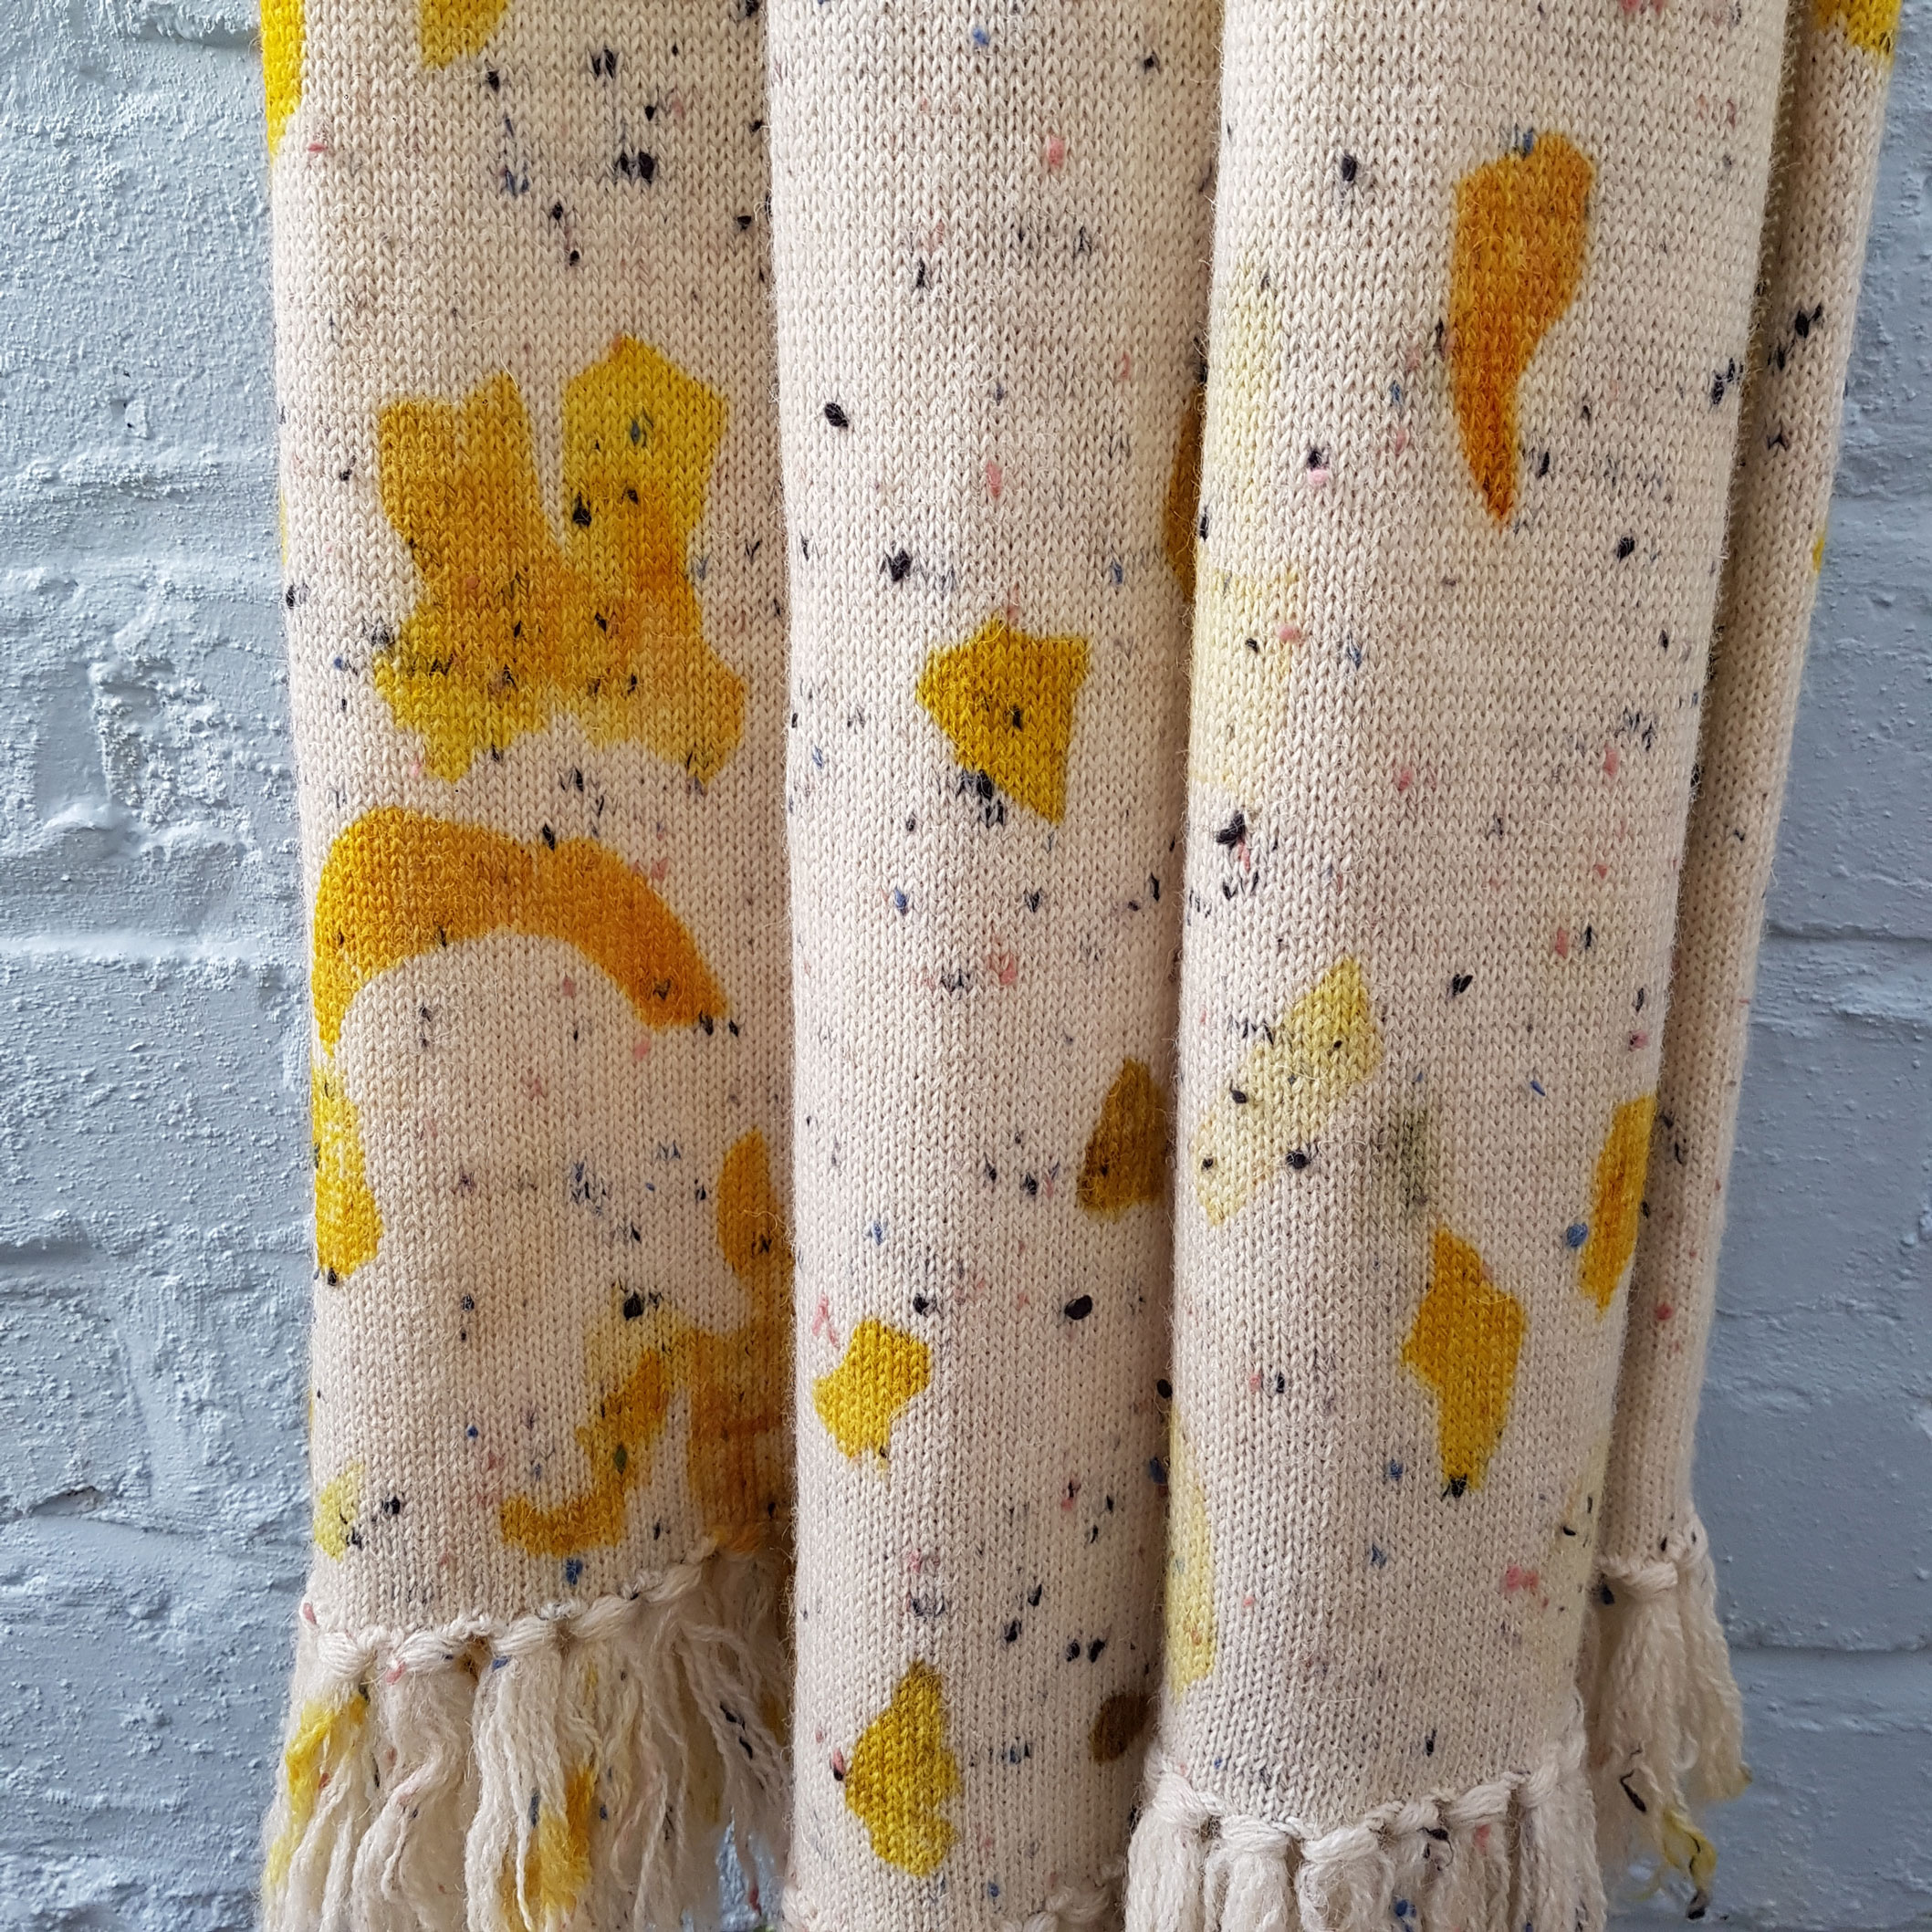 Burns, R. (2017) Bundle Dye 6. (Own Collection)